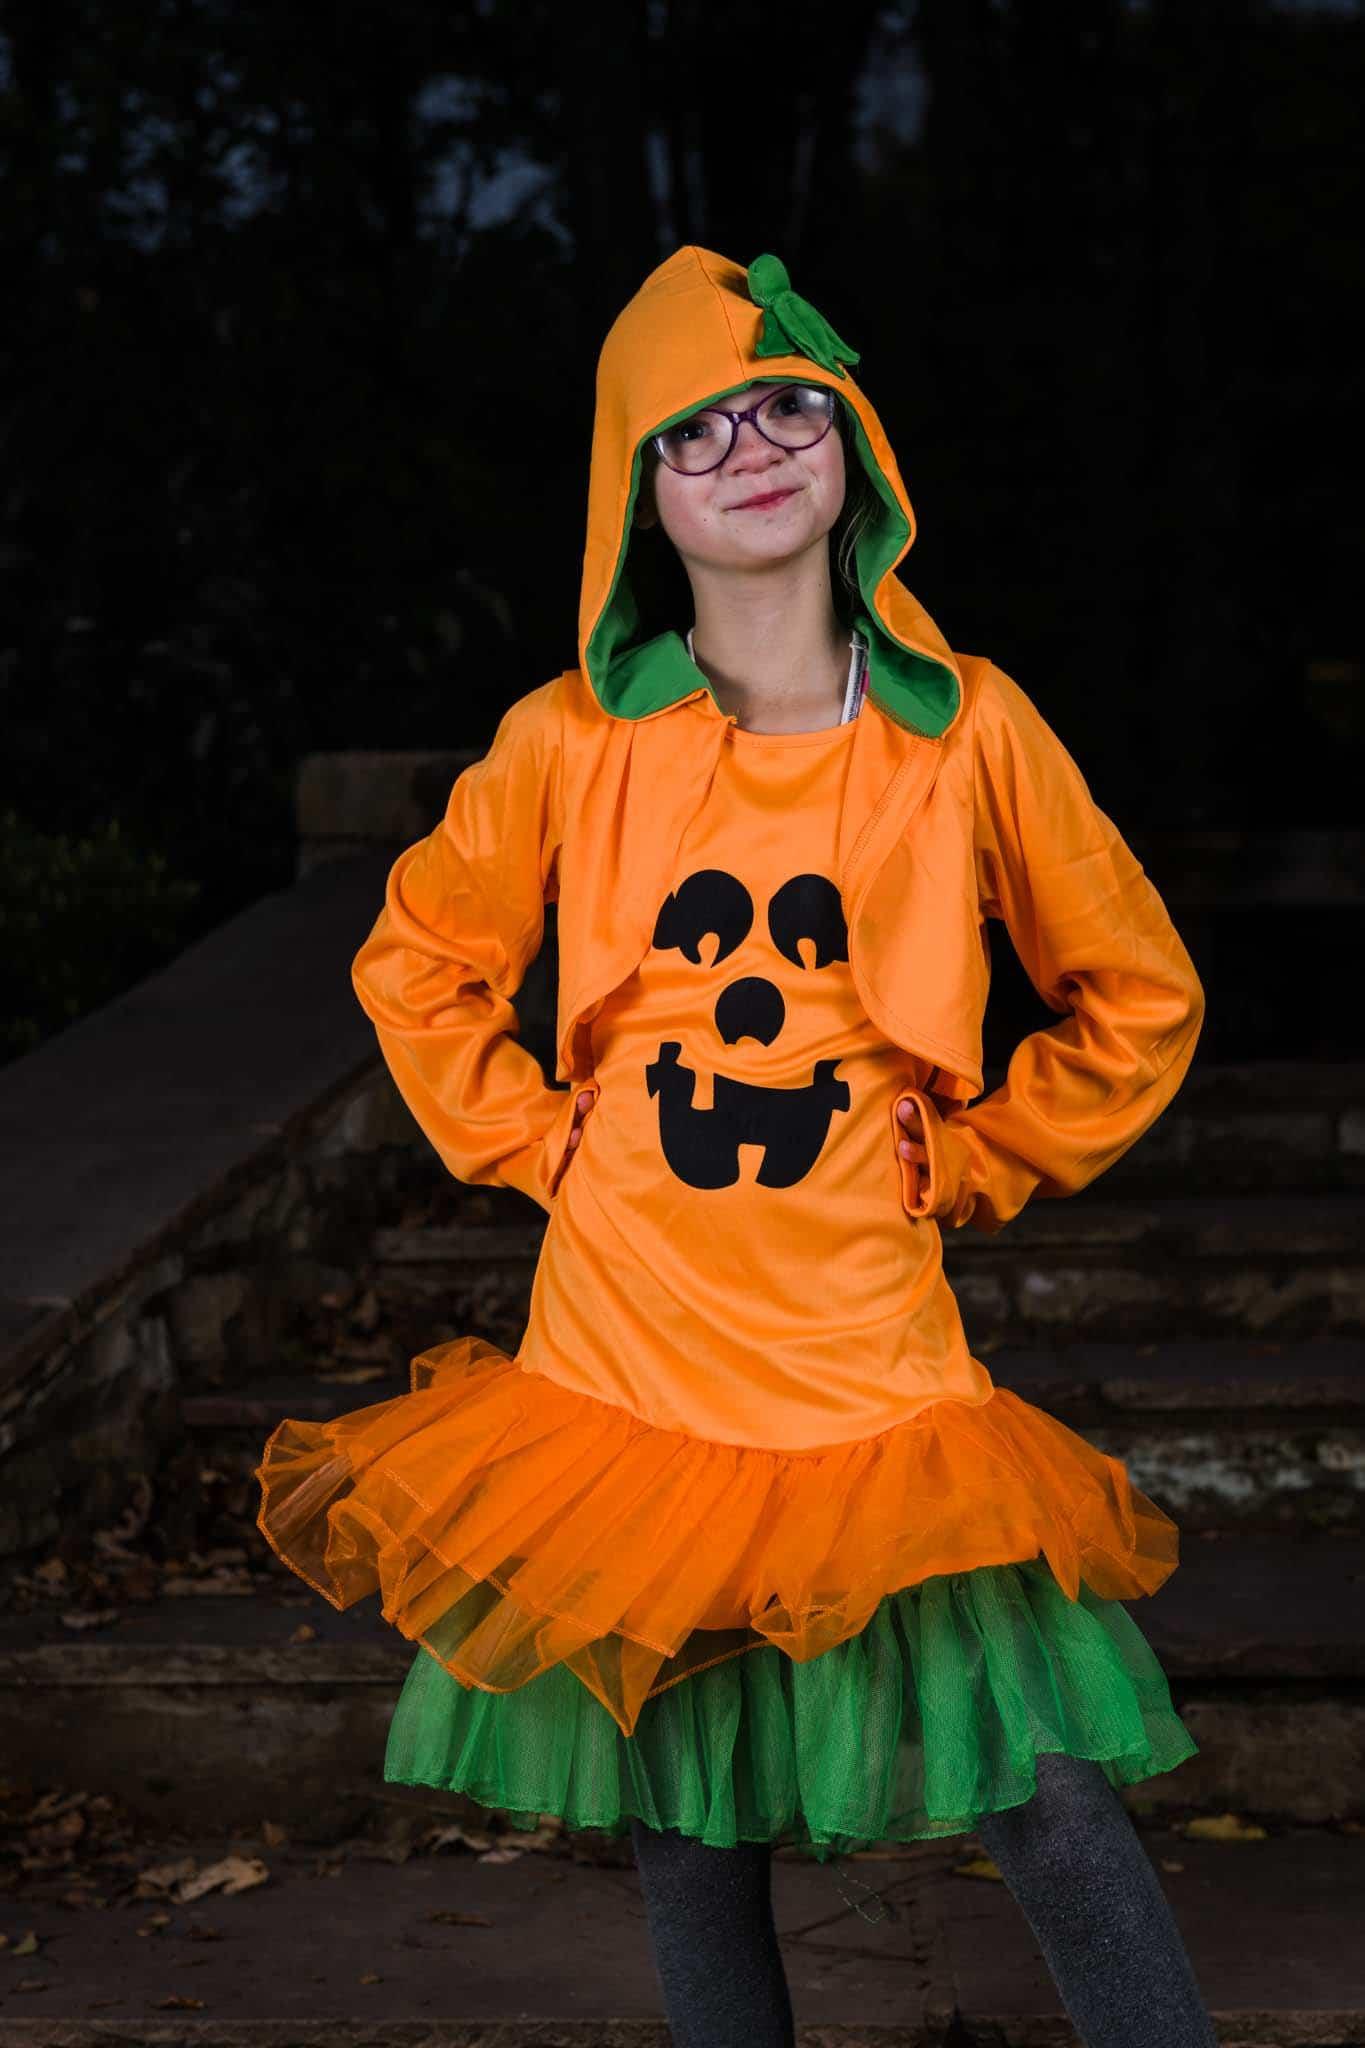 halloween pumpkin costume for girls form Funidelia